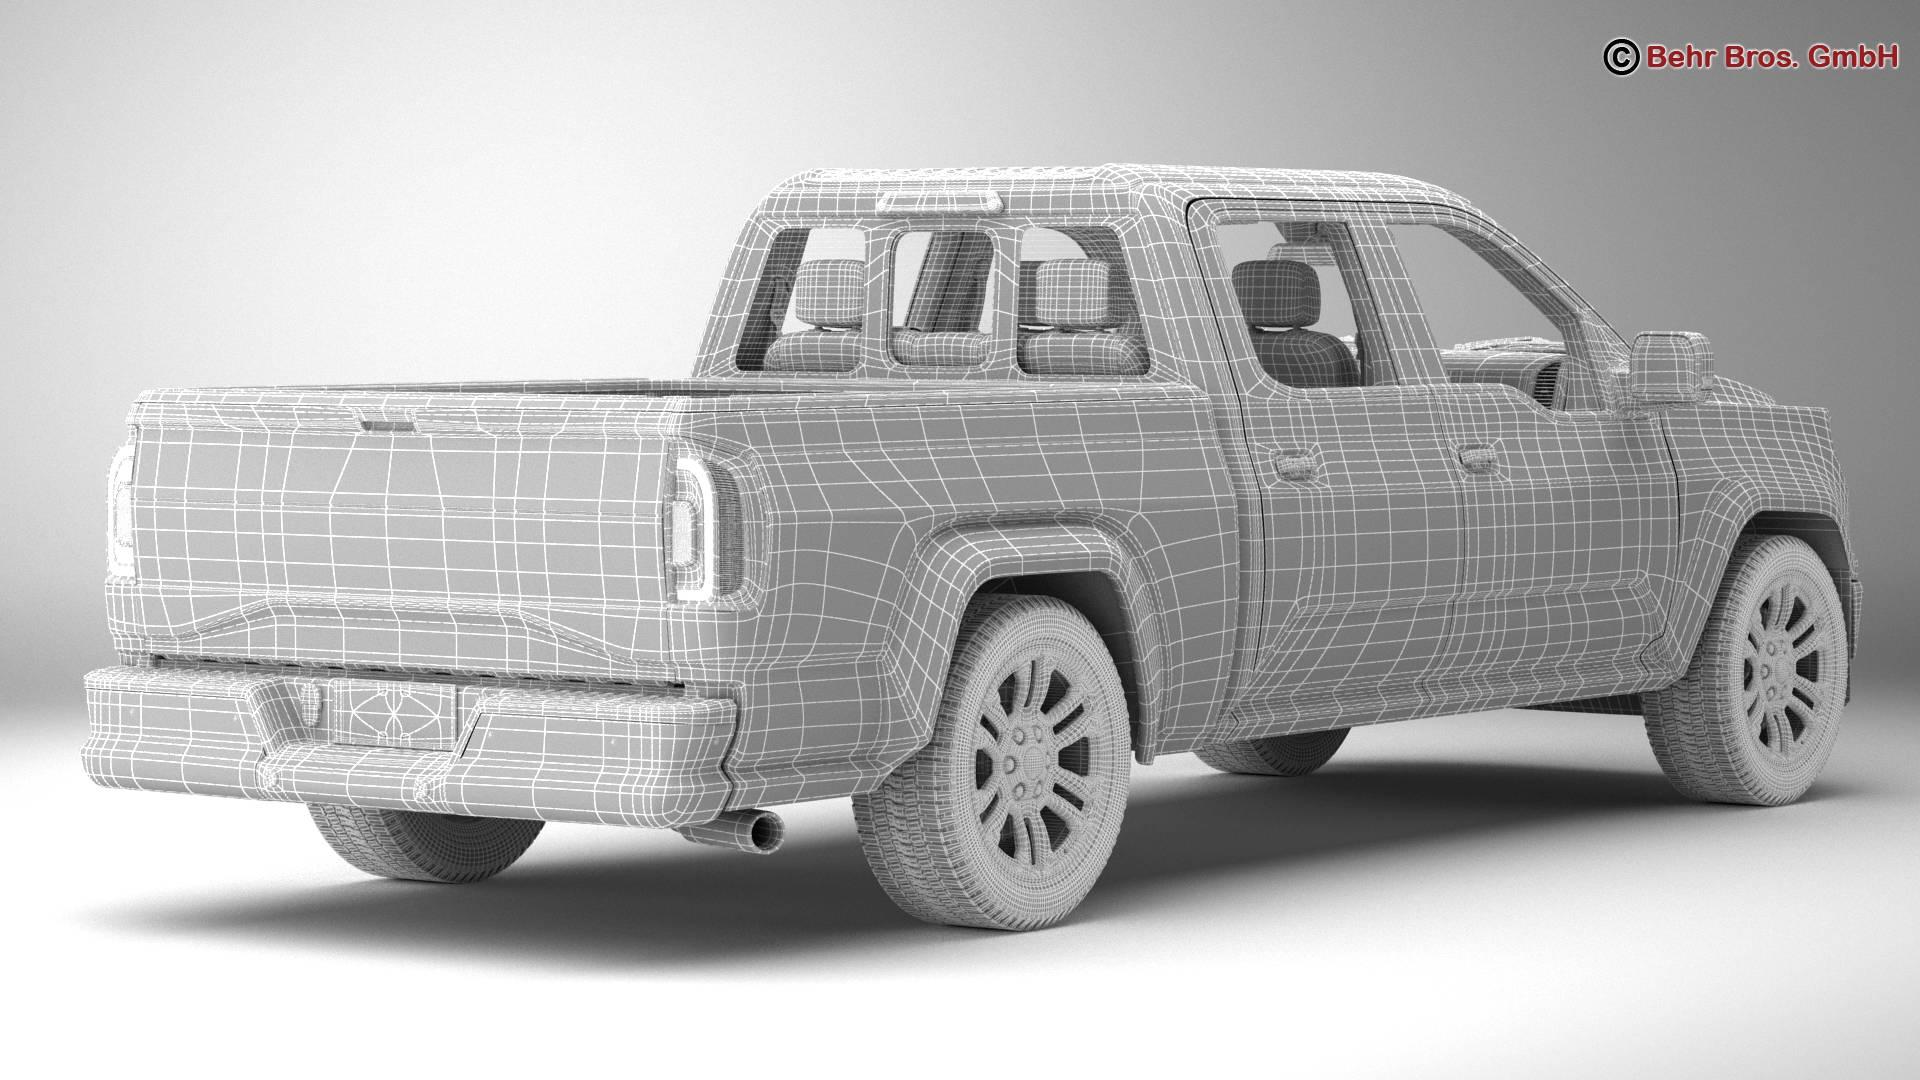 generic pickup 3d model 3ds max fbx c4d lwo ma mb obj 219885